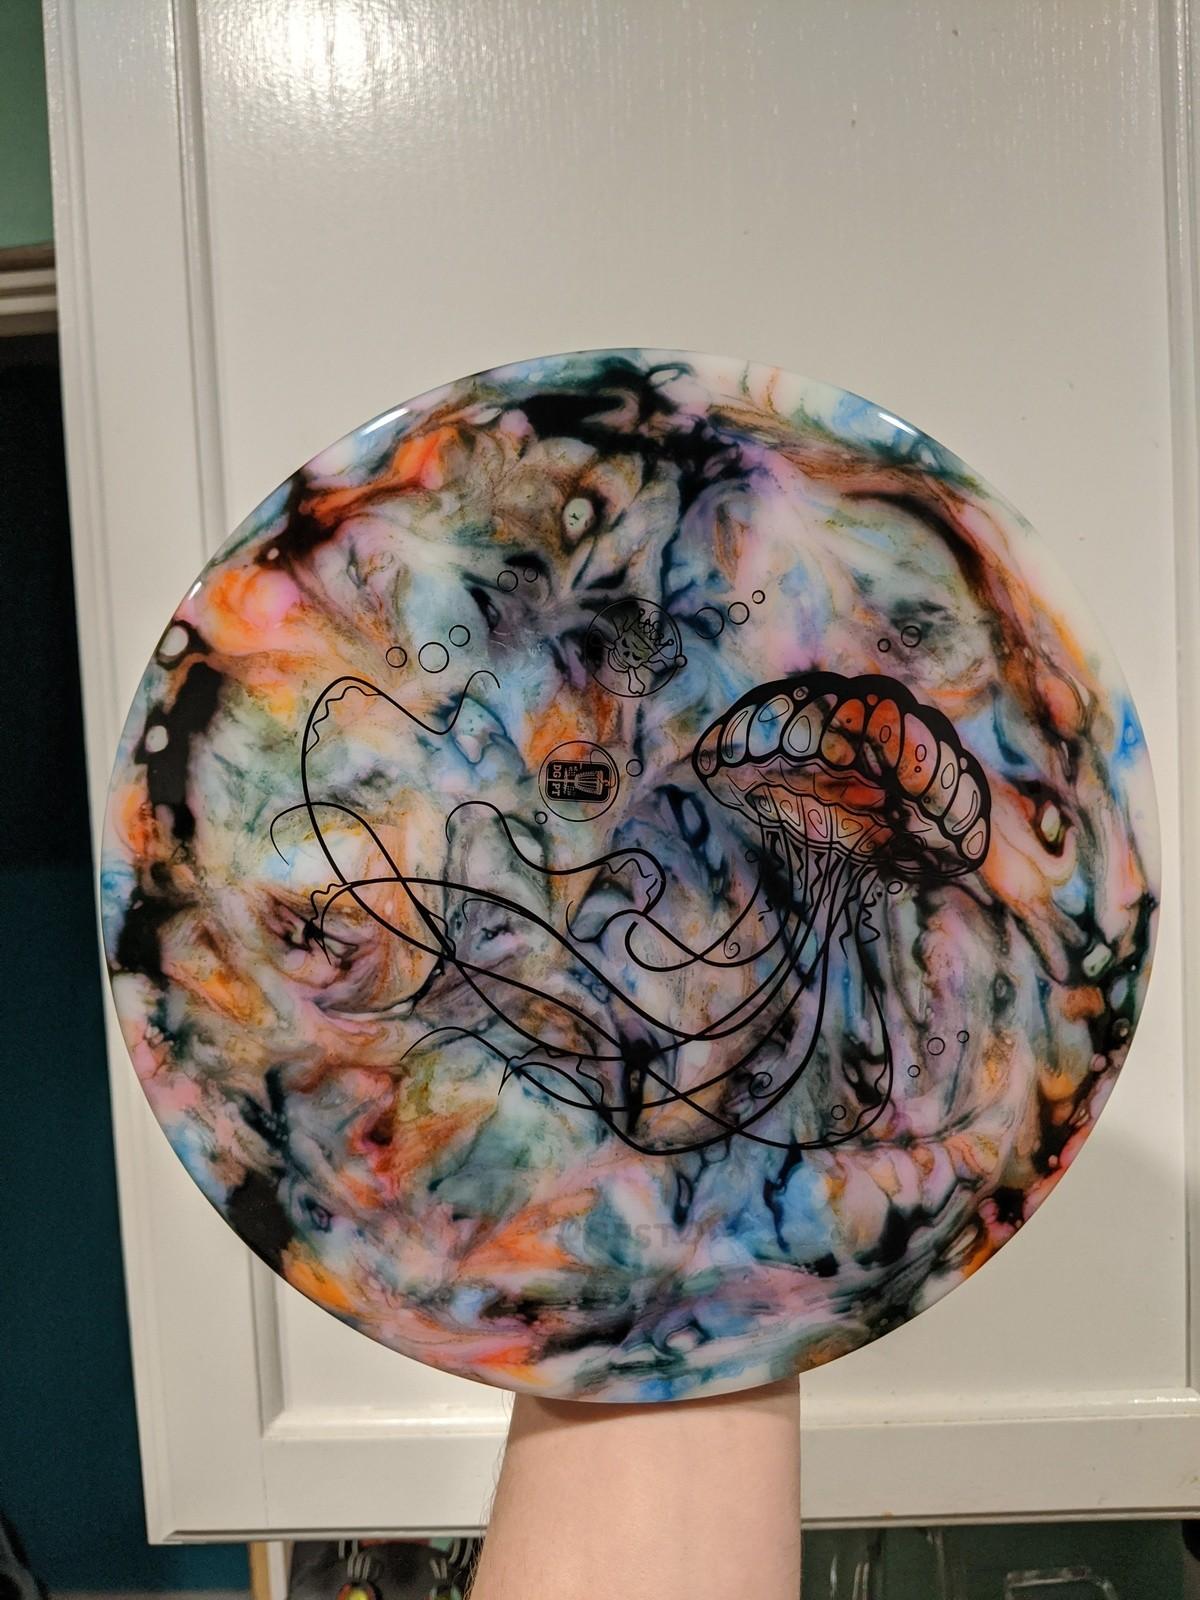 My latest custom dye job. It's a golf disc.. .. Thats prity dope op good job!